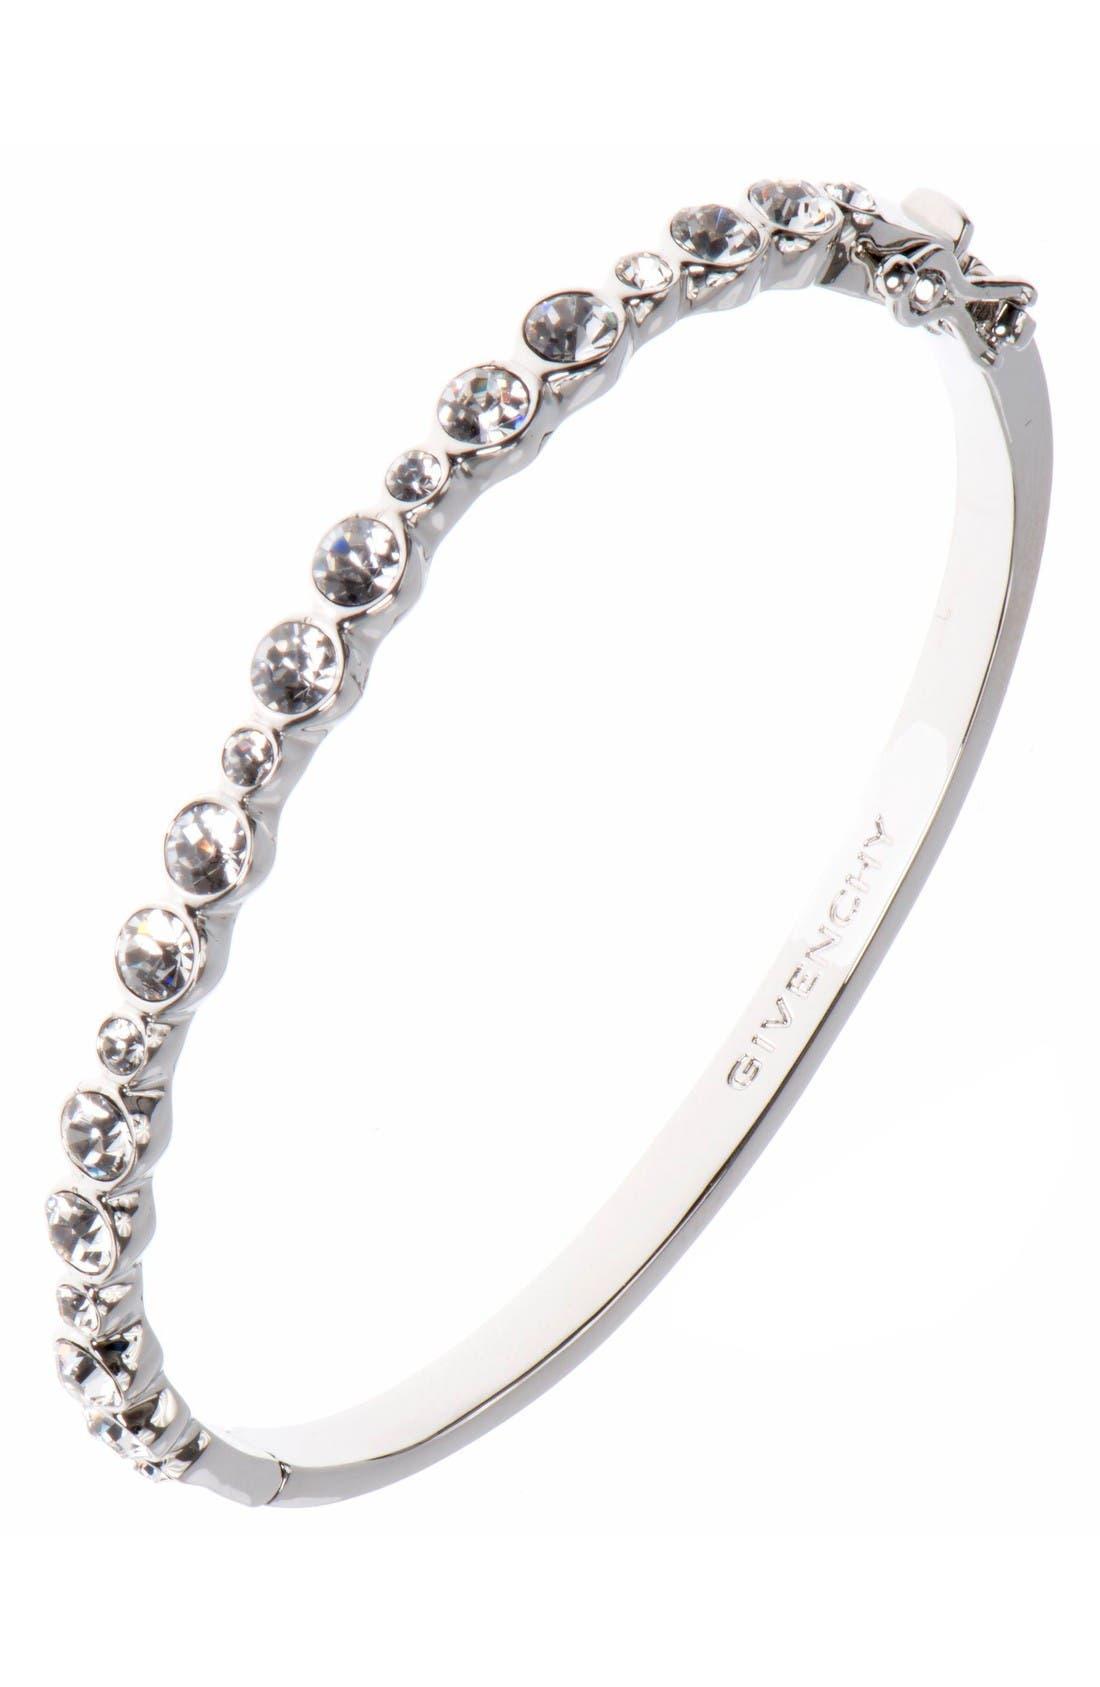 GIVENCHY Small Crystal Bracelet